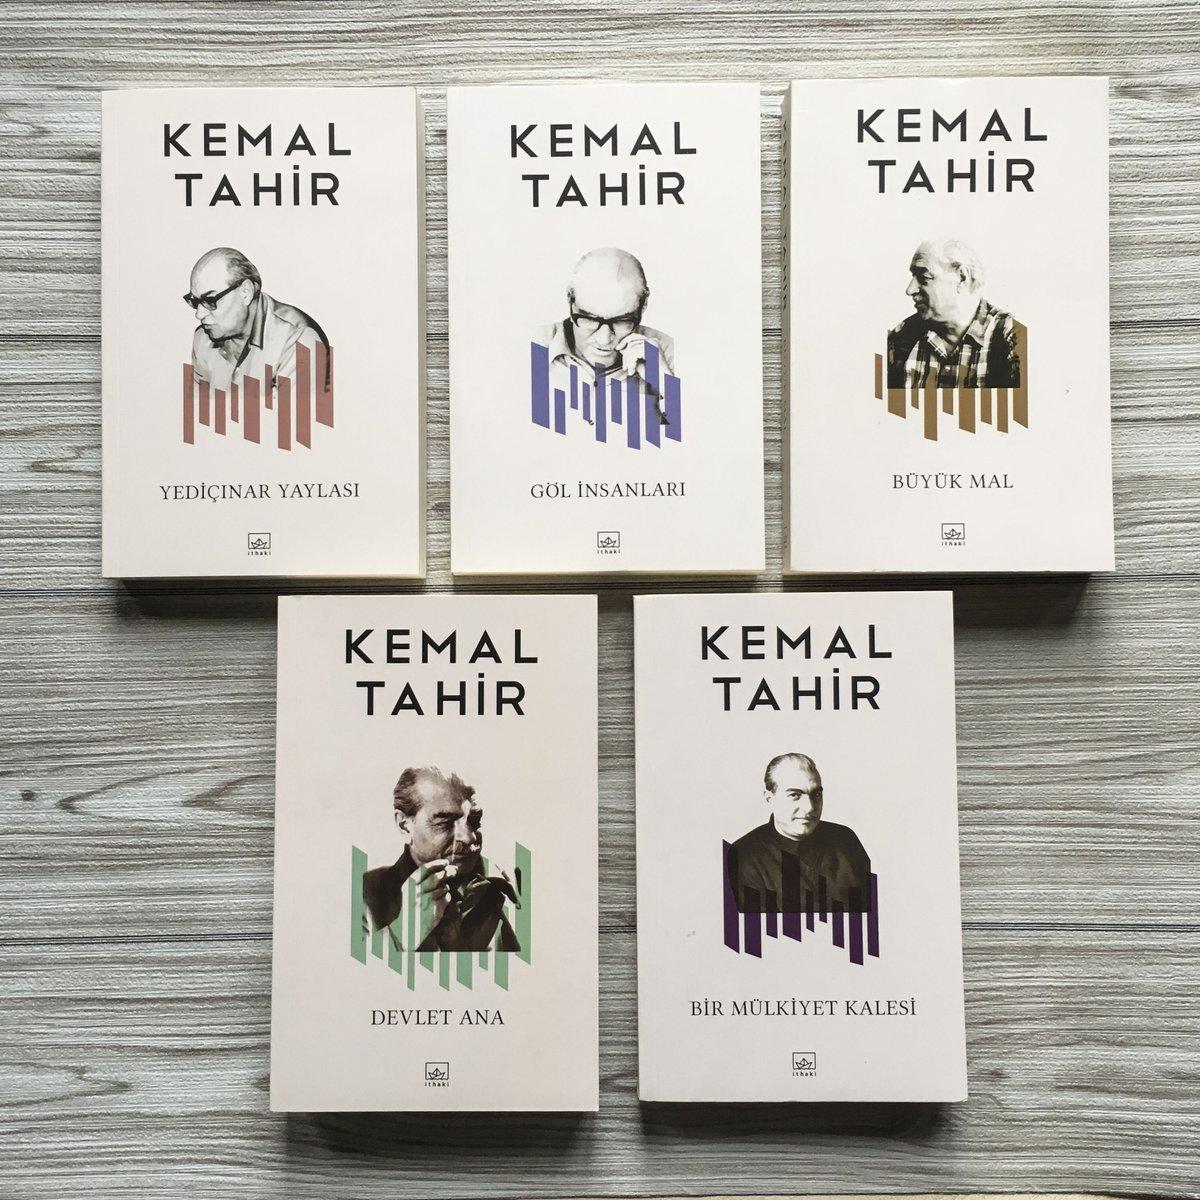 Kemal Tahir Romanları 2.jpg